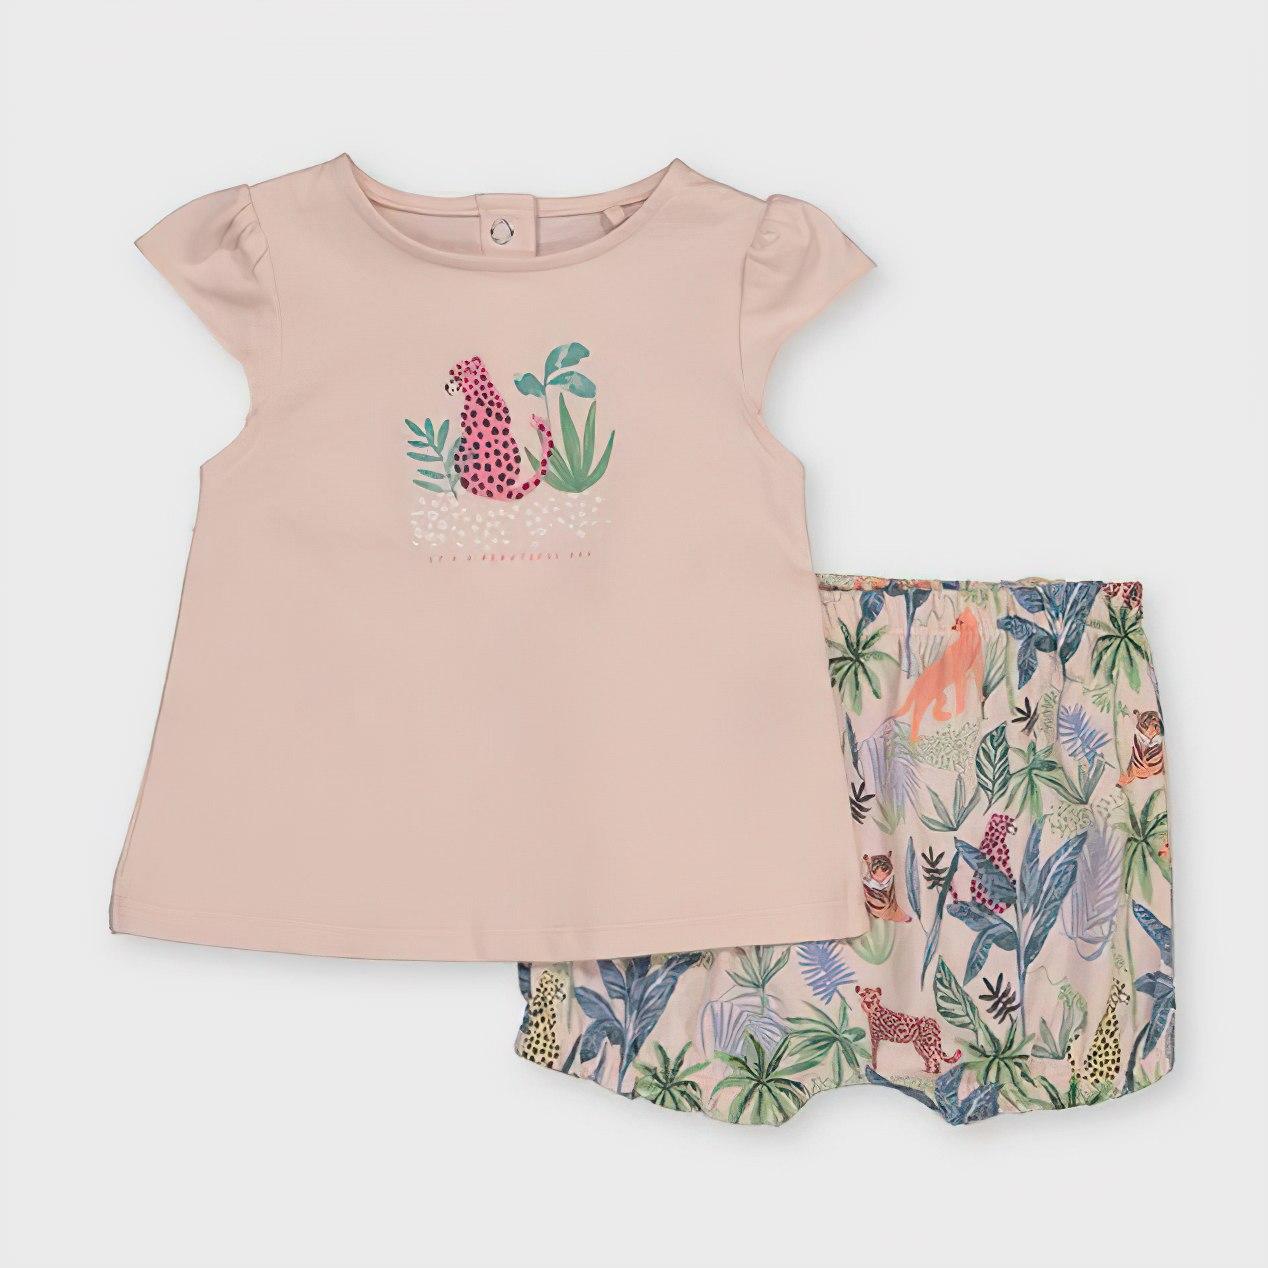 Pink Top & Jungle Print Shorts Set now £3.50 click & collect @ Argos